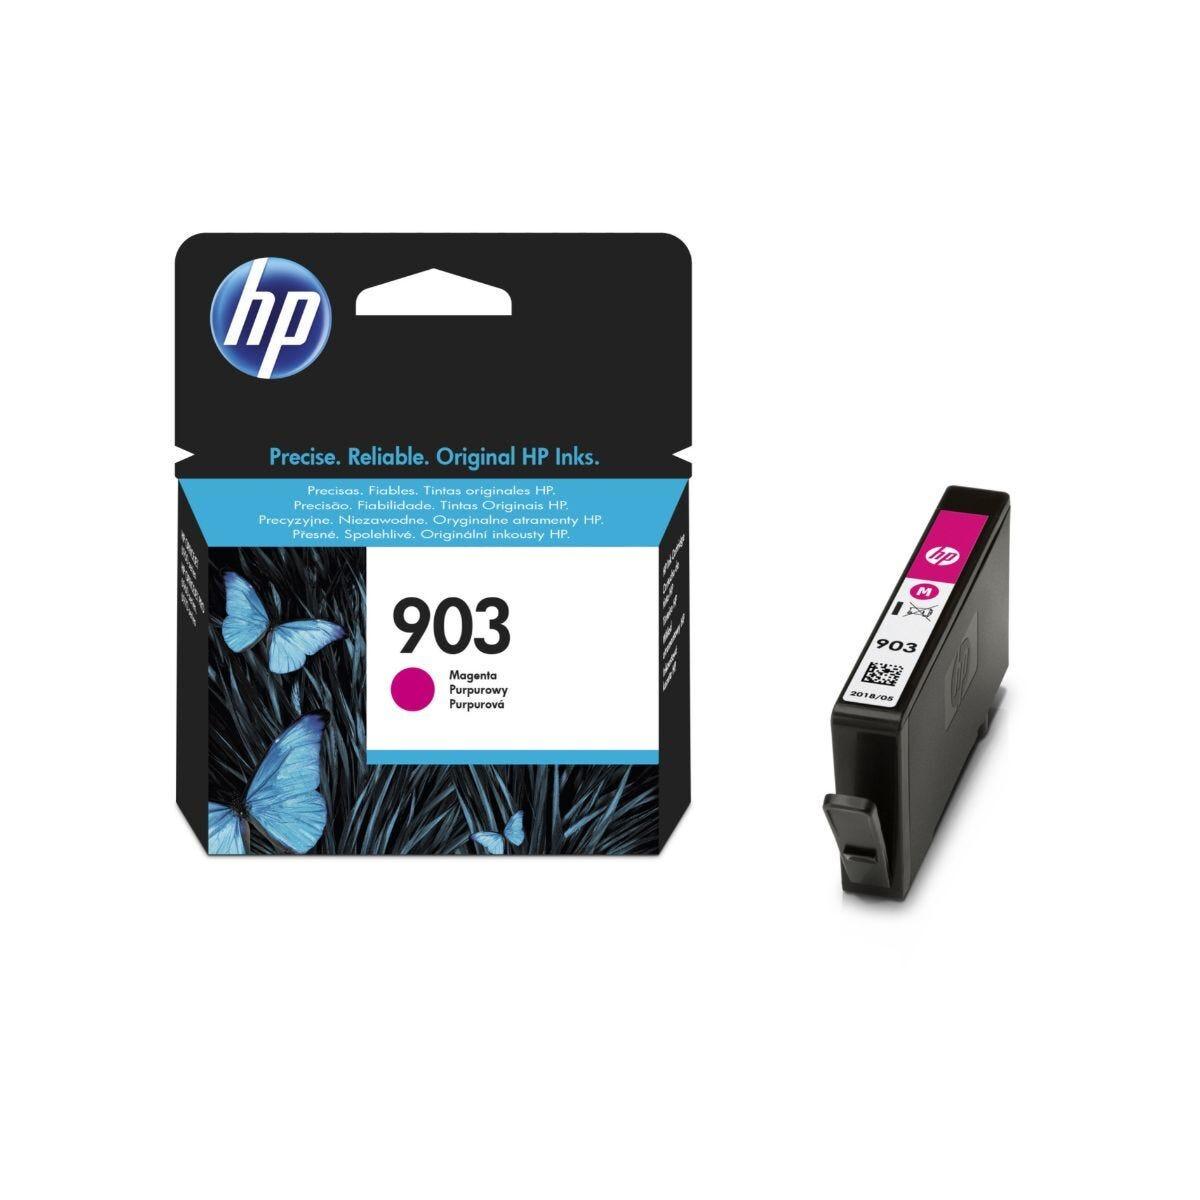 HP 903 Ink Cartridge Magenta